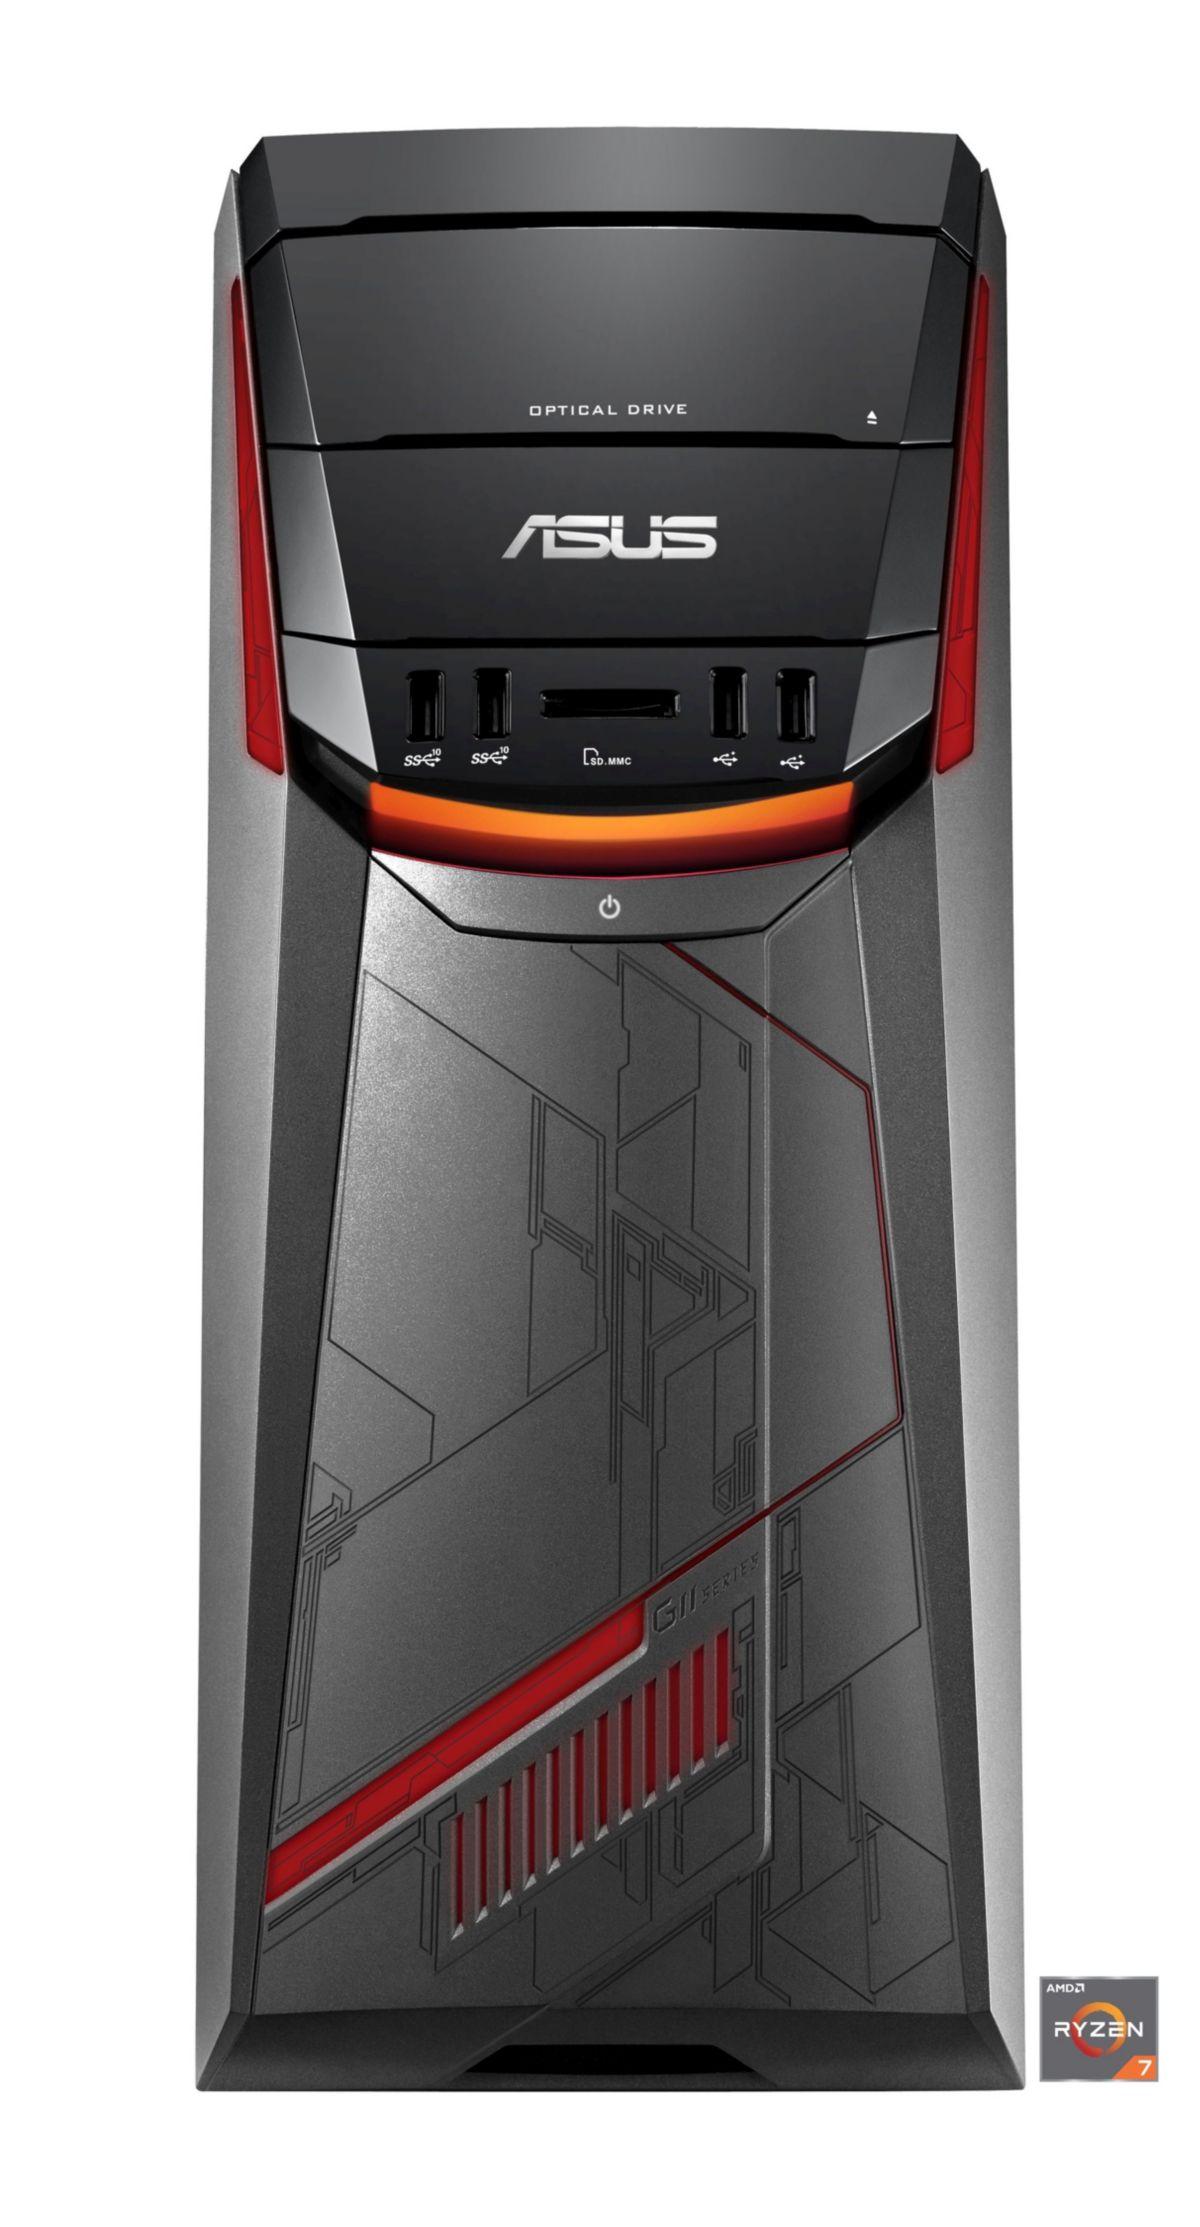 ASUS G11DF DE016T Gaming PC AMD 8 Core GTX 1070 128 GB SSD 1 TB HDD 16 GB